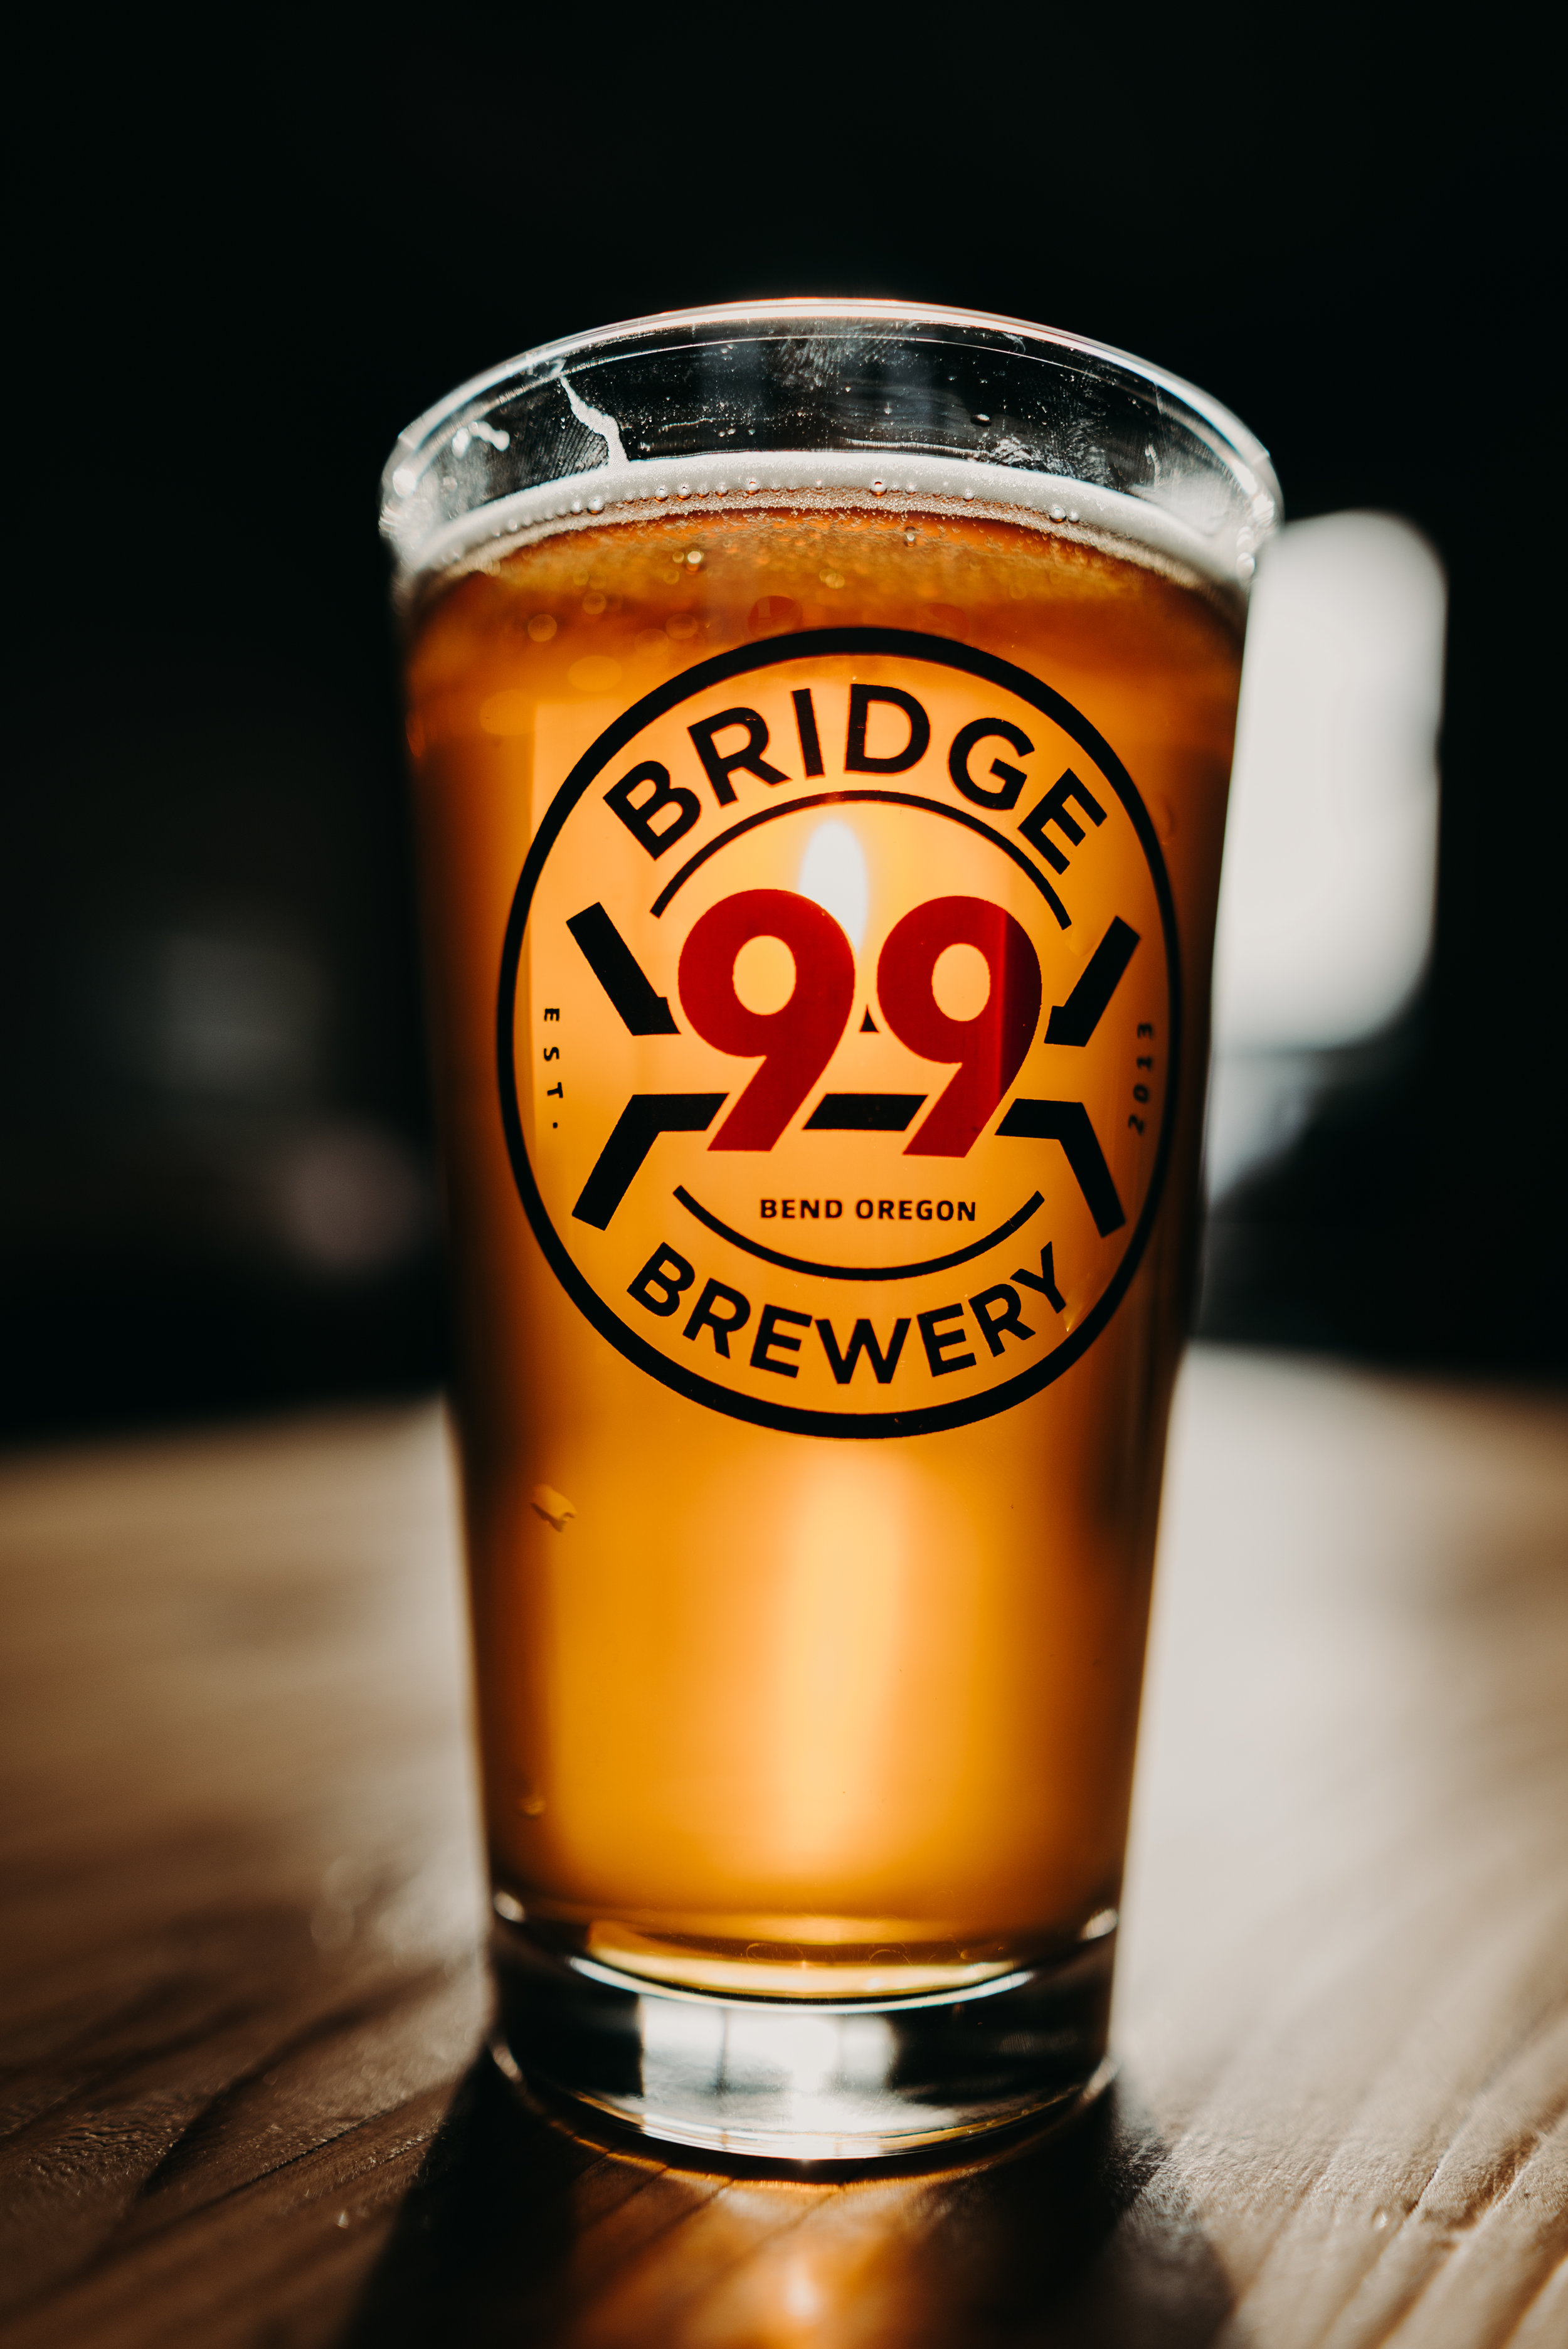 Bridge 99 Brewing